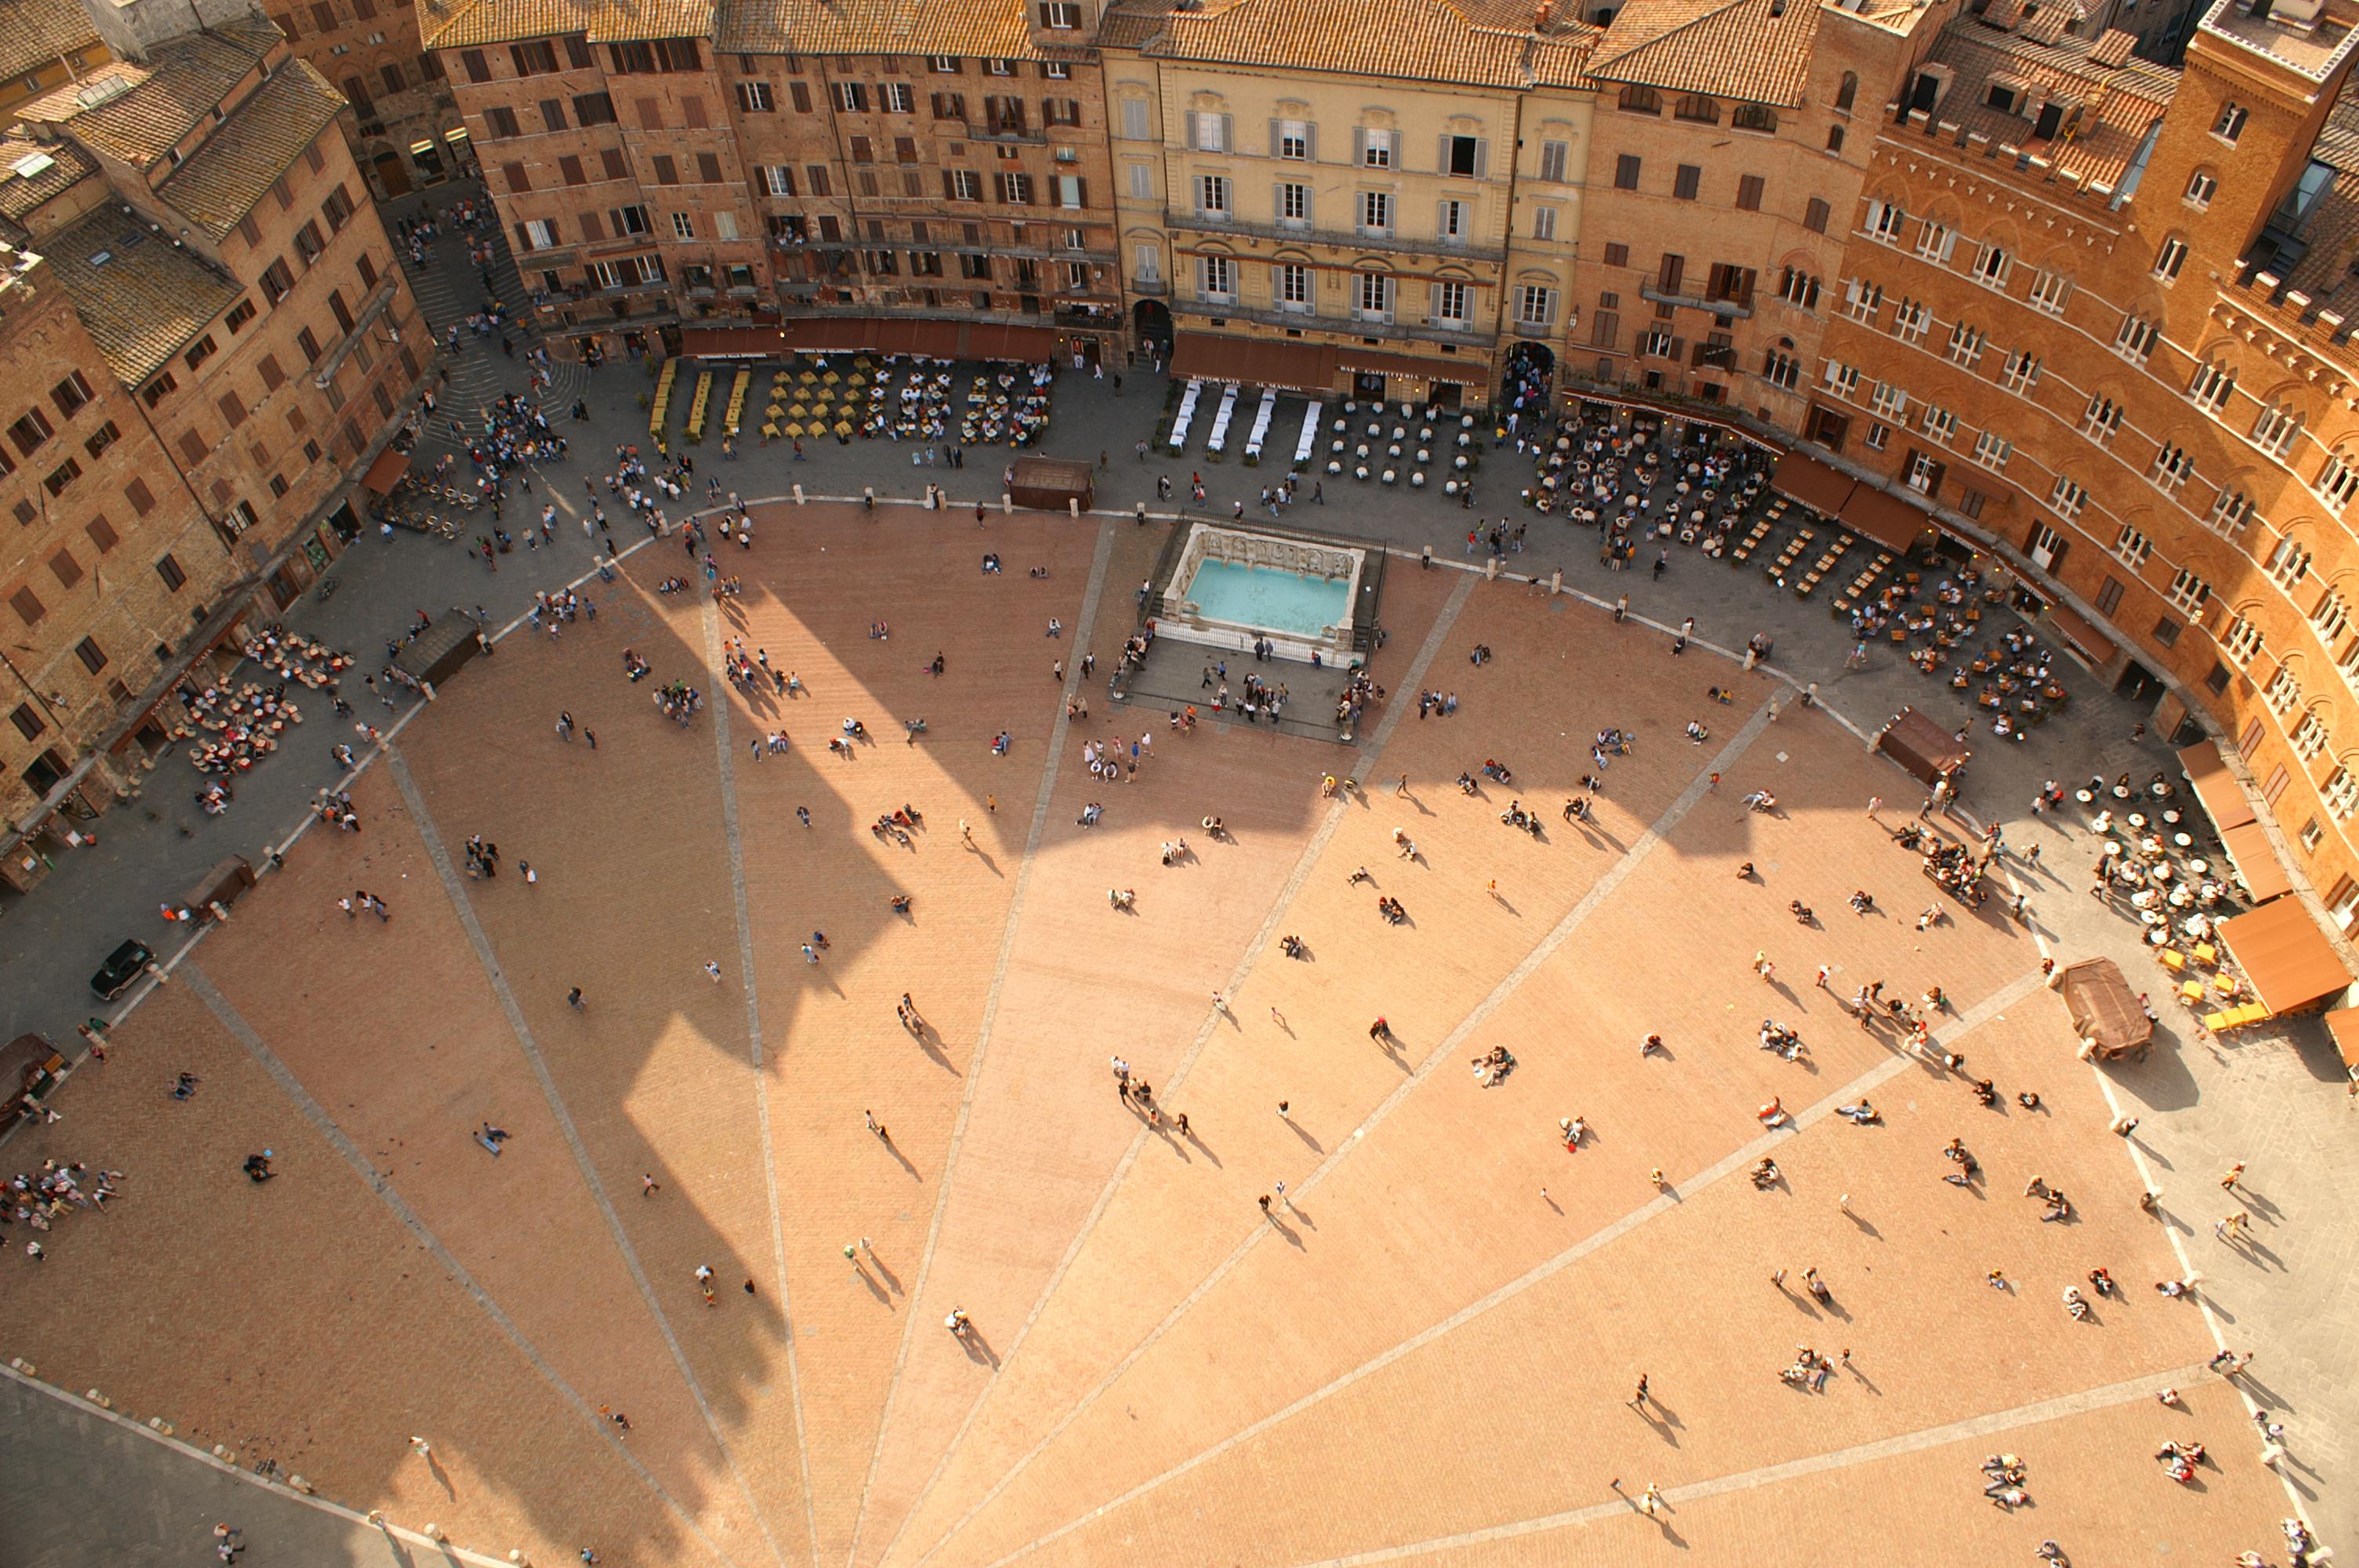 Siena, Piazza del Campo, gezien van de Torre del Mangia